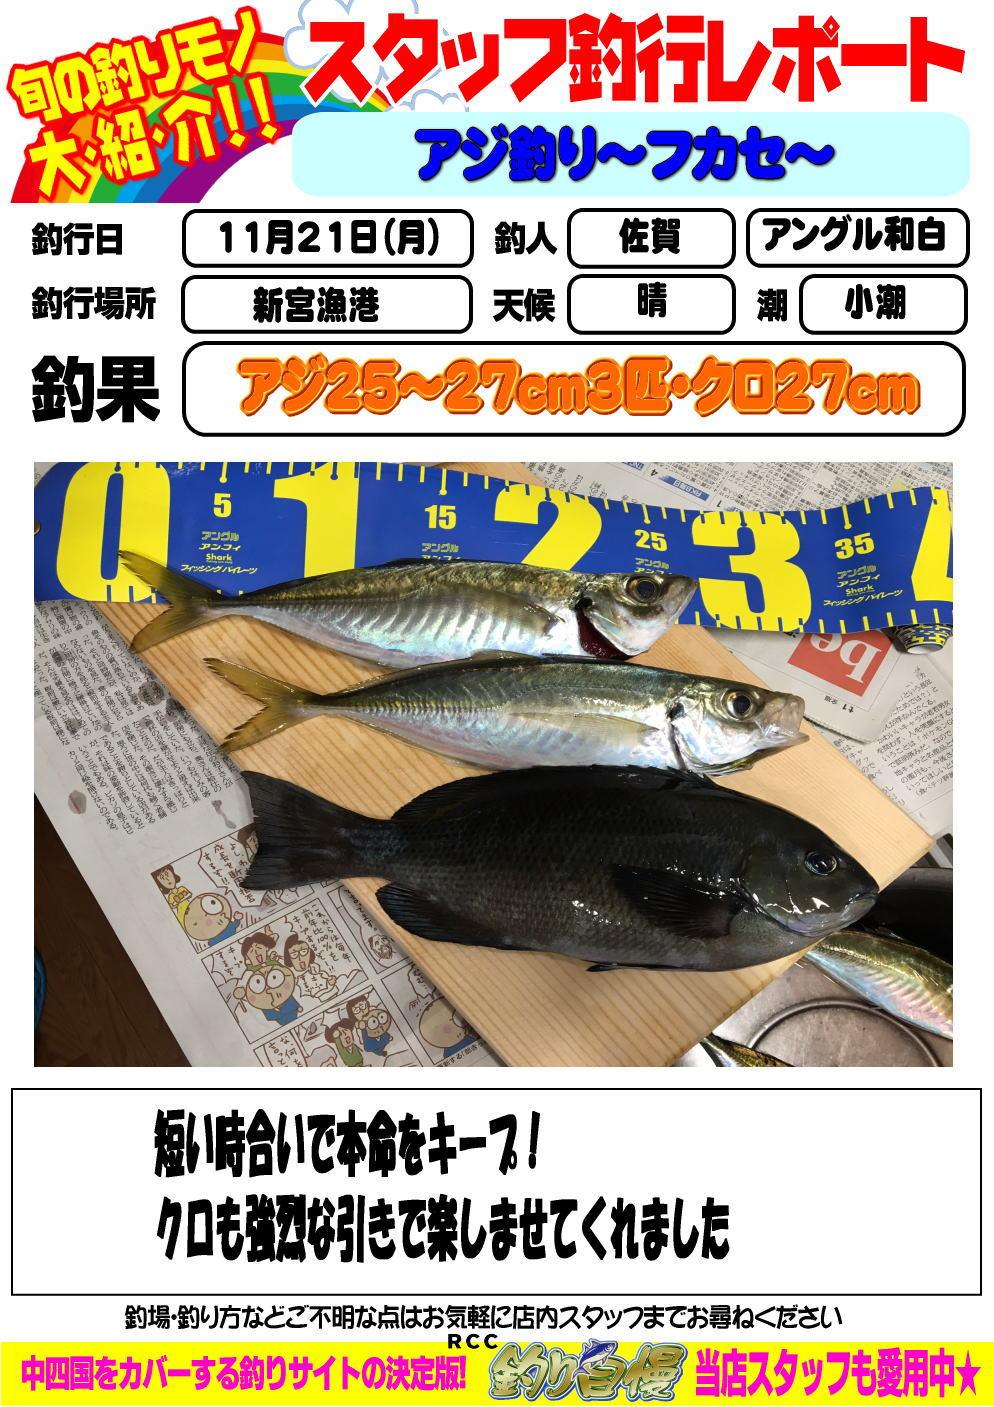 http://www.e-angle.co.jp/shop/blog/image.jpg%E3%82%A2%E3%82%B8.jpg